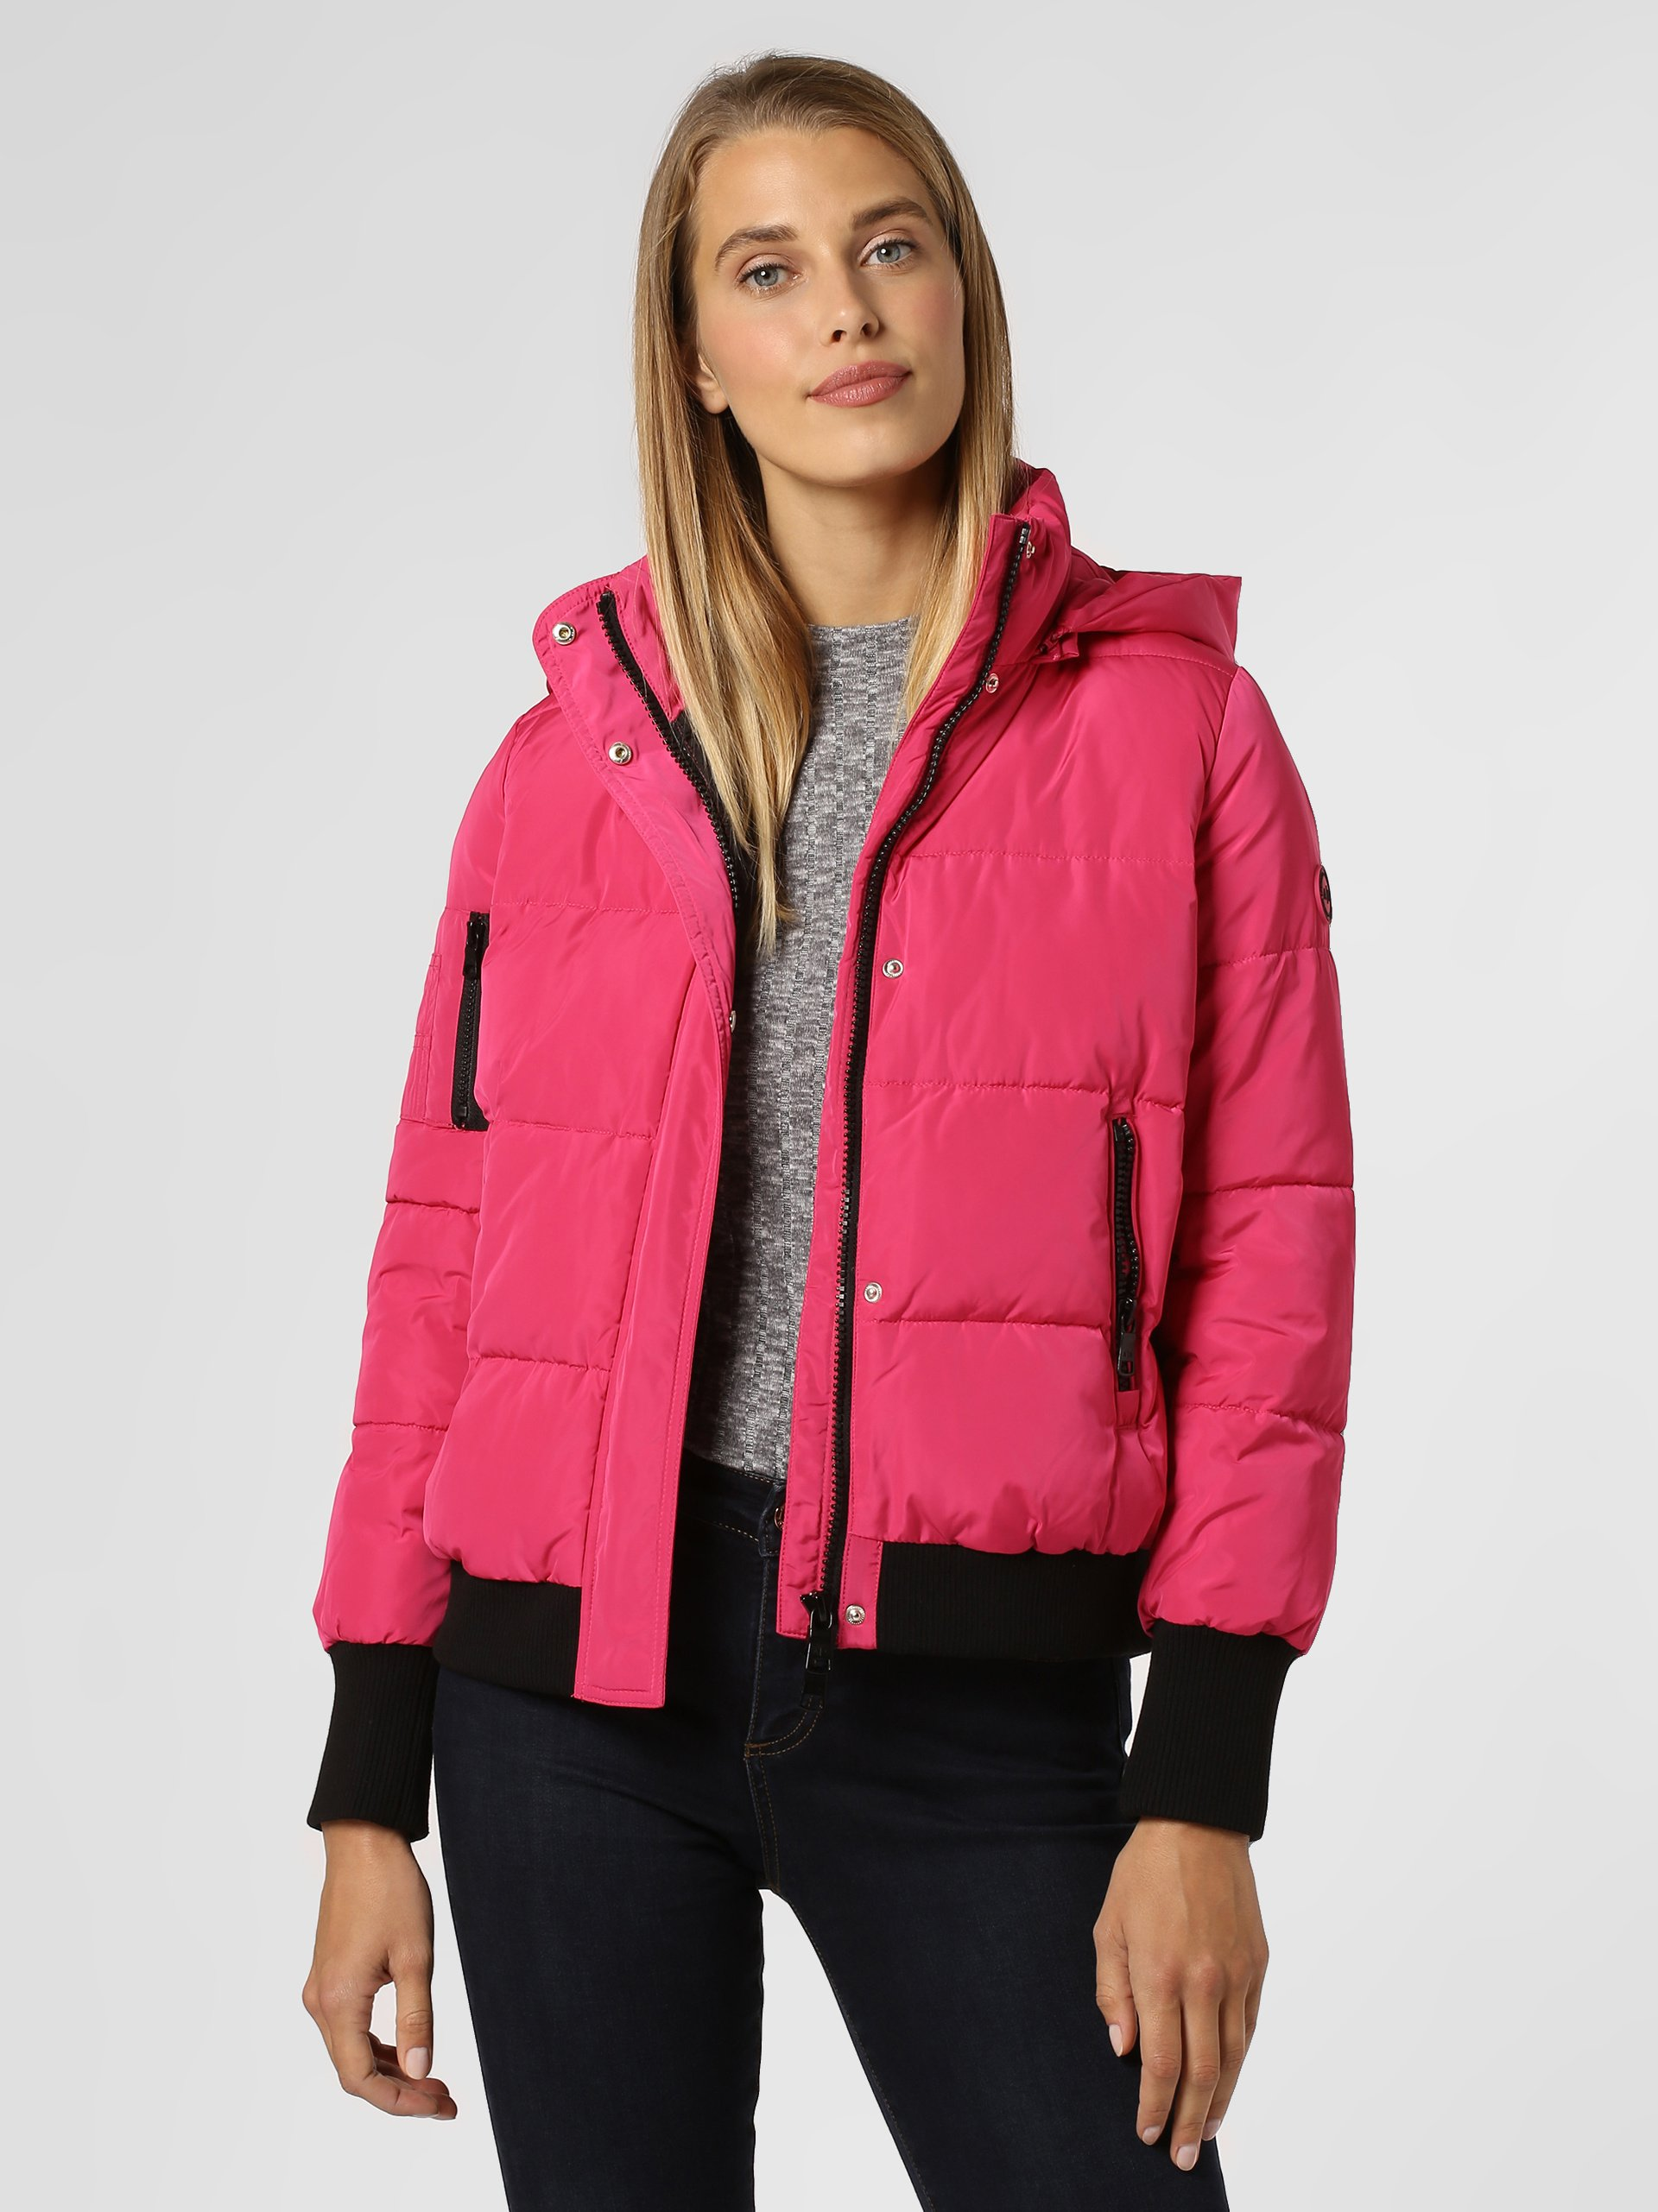 Armani Exchange Damen Jacke